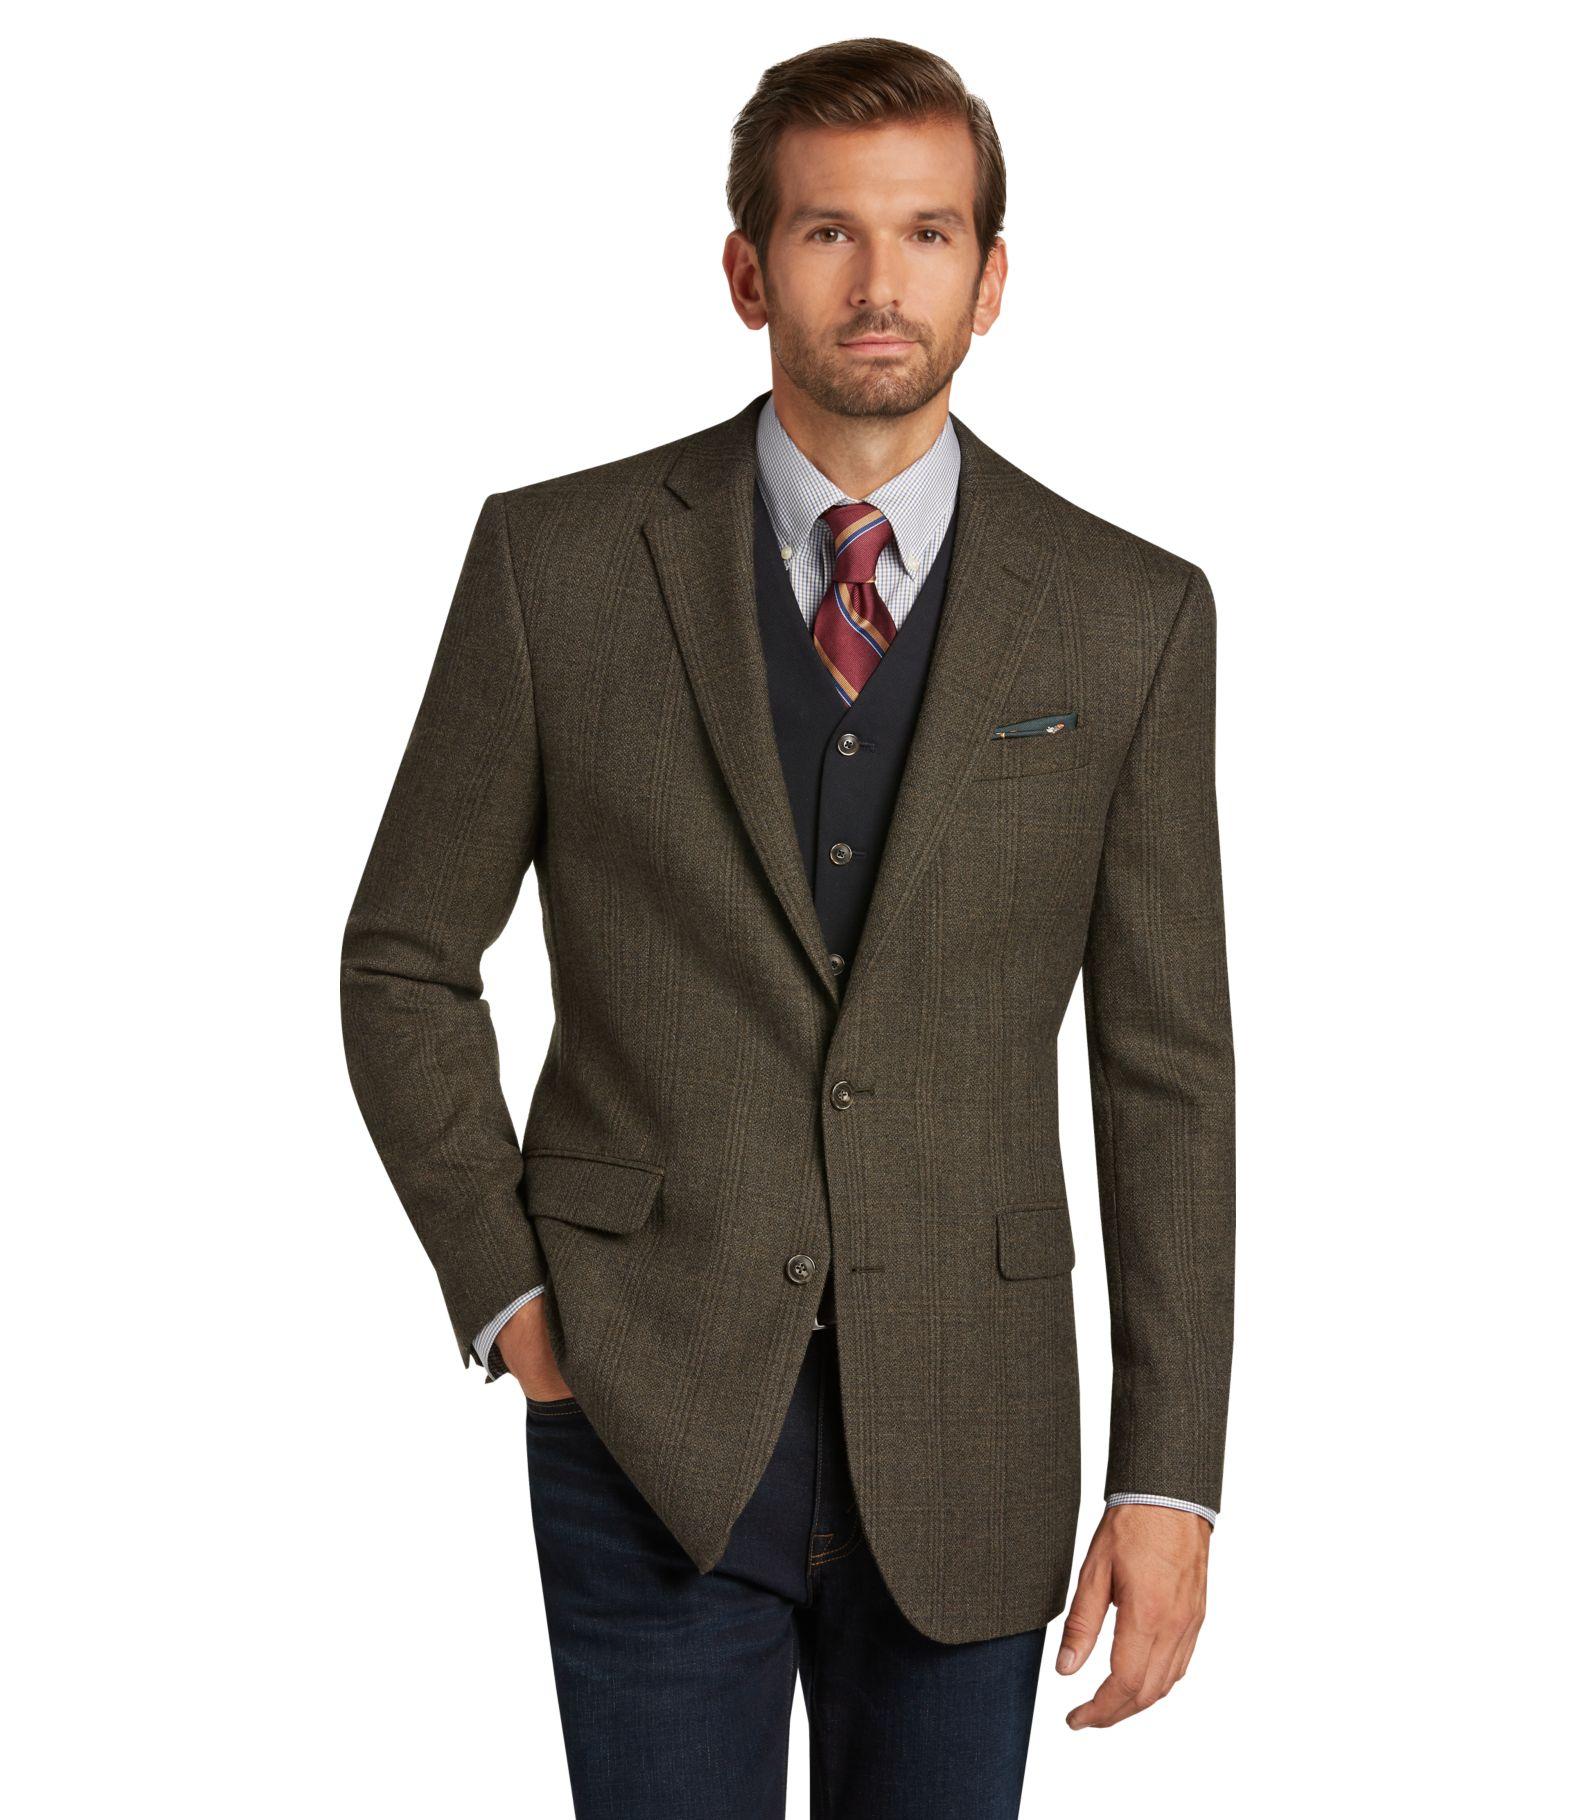 Sportcoats & Blazers for Men | Shop Sport Jackets | JoS. A. Bank